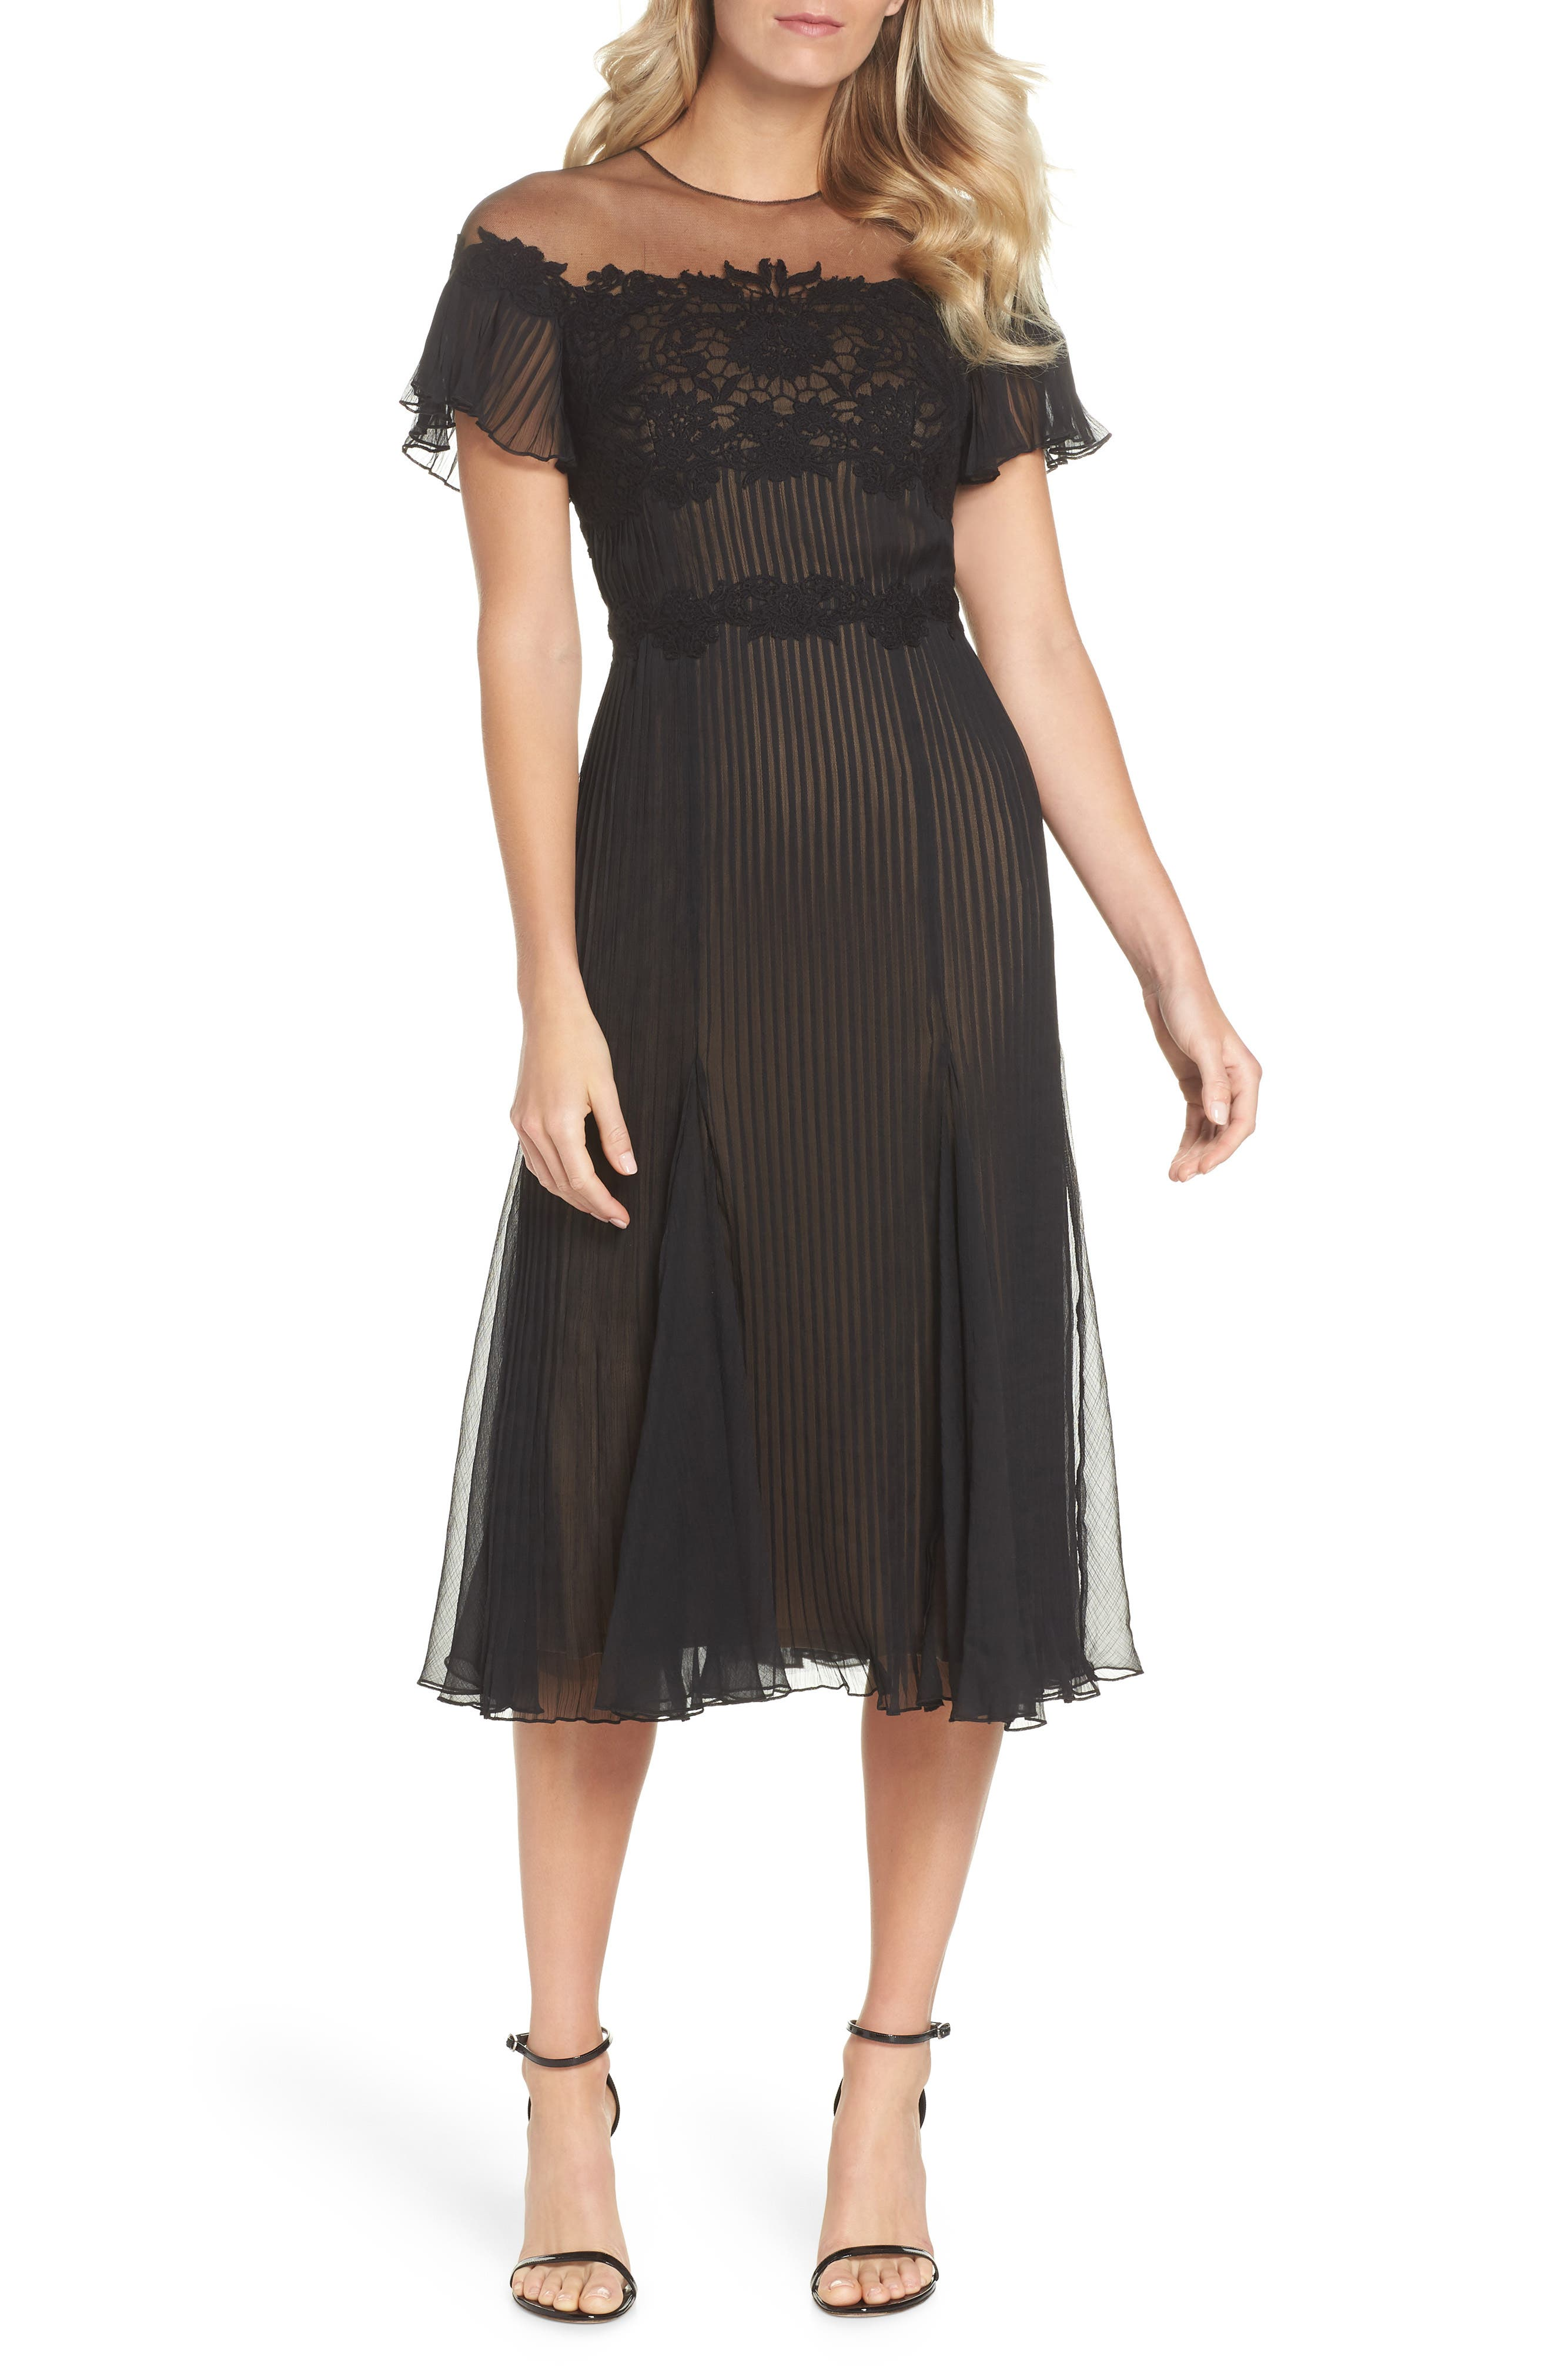 Lace & Chiffon A-Line Dress,                         Main,                         color, Black/ Nude